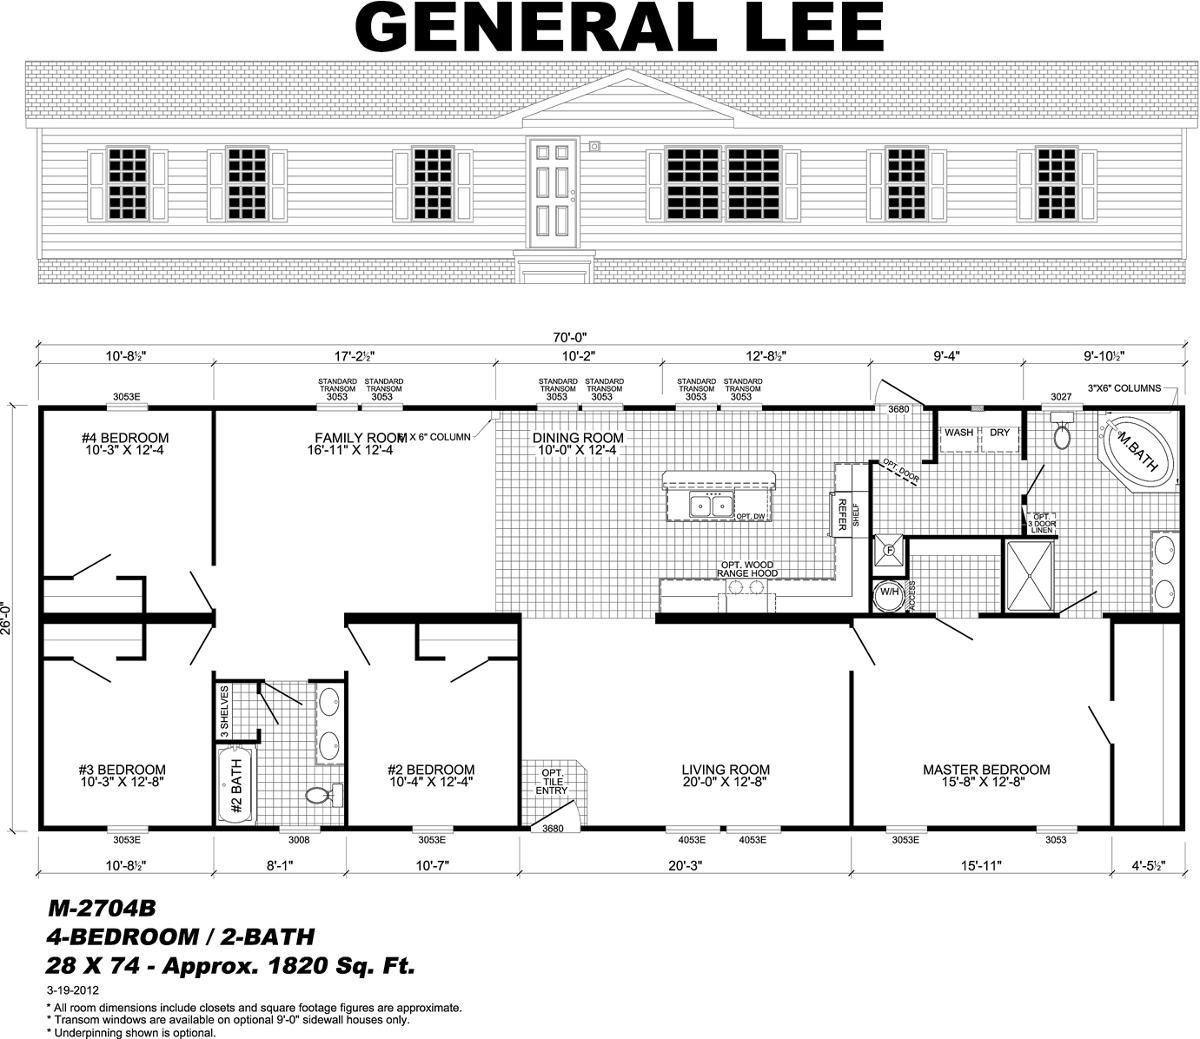 General Lee Modular home floor plans, Mobile home floor